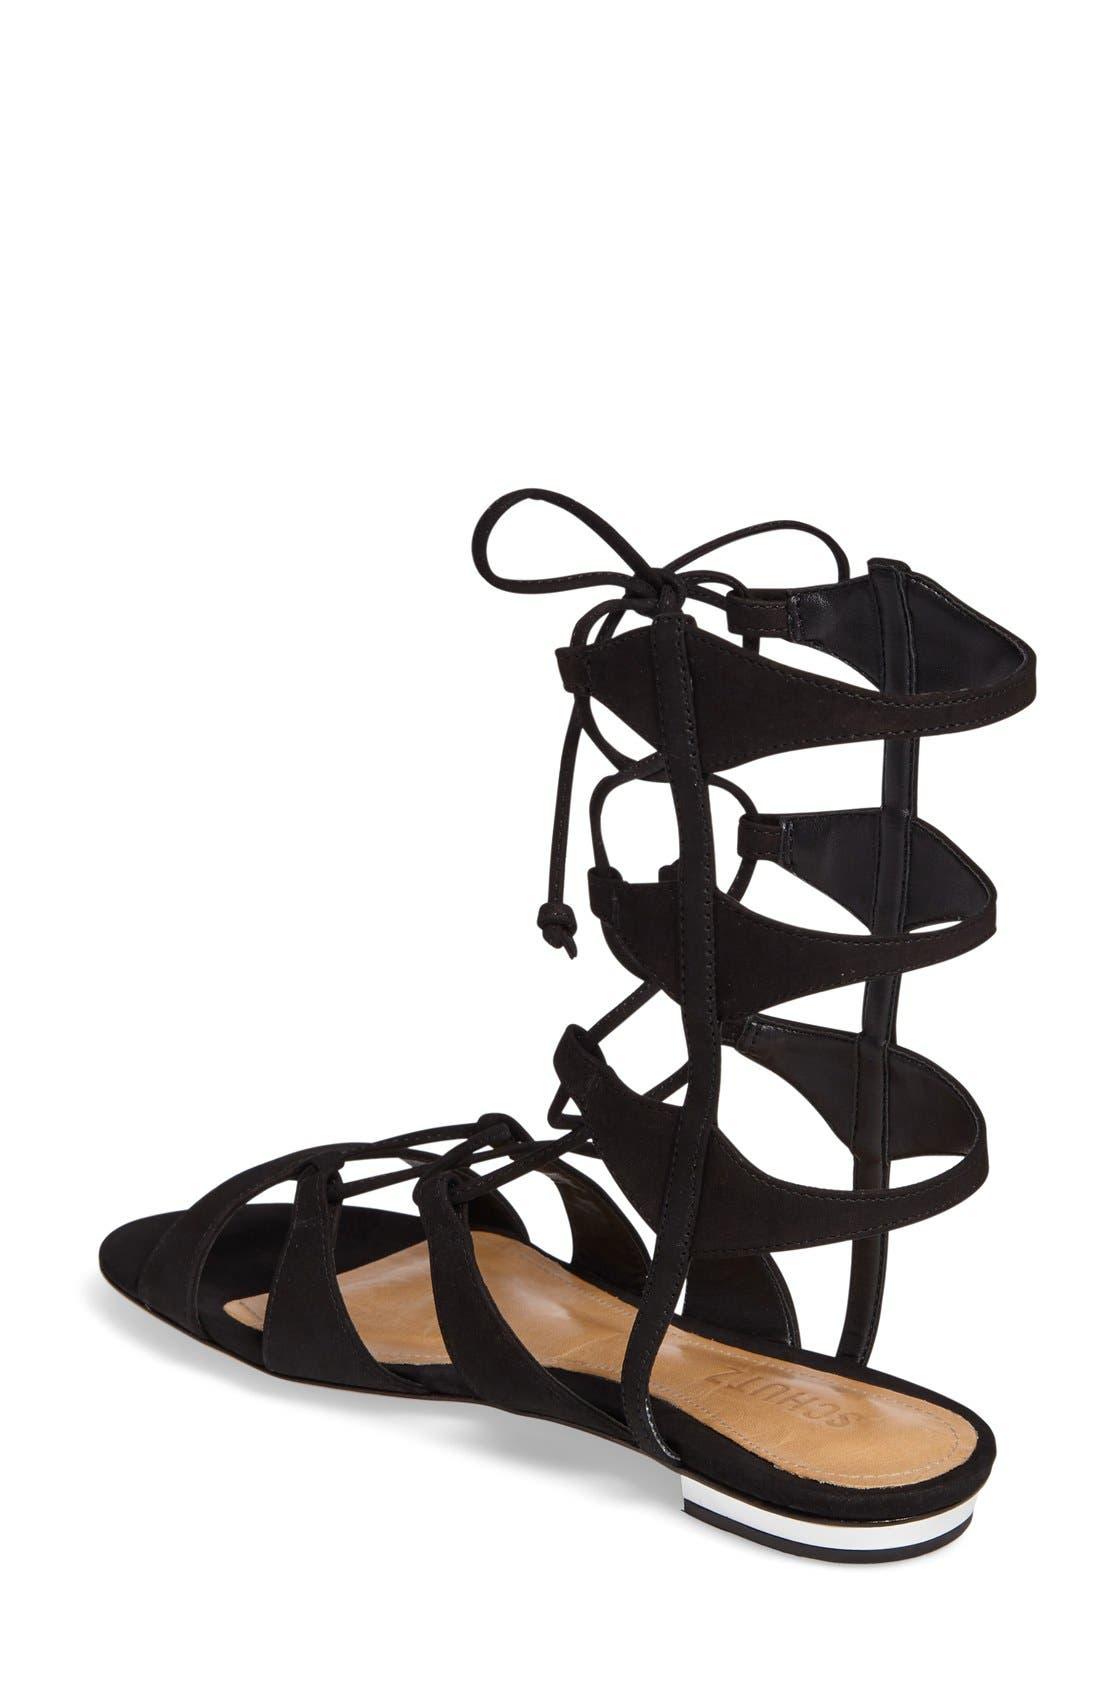 Erlina Lace-Up Sandal,                             Alternate thumbnail 3, color,                             004